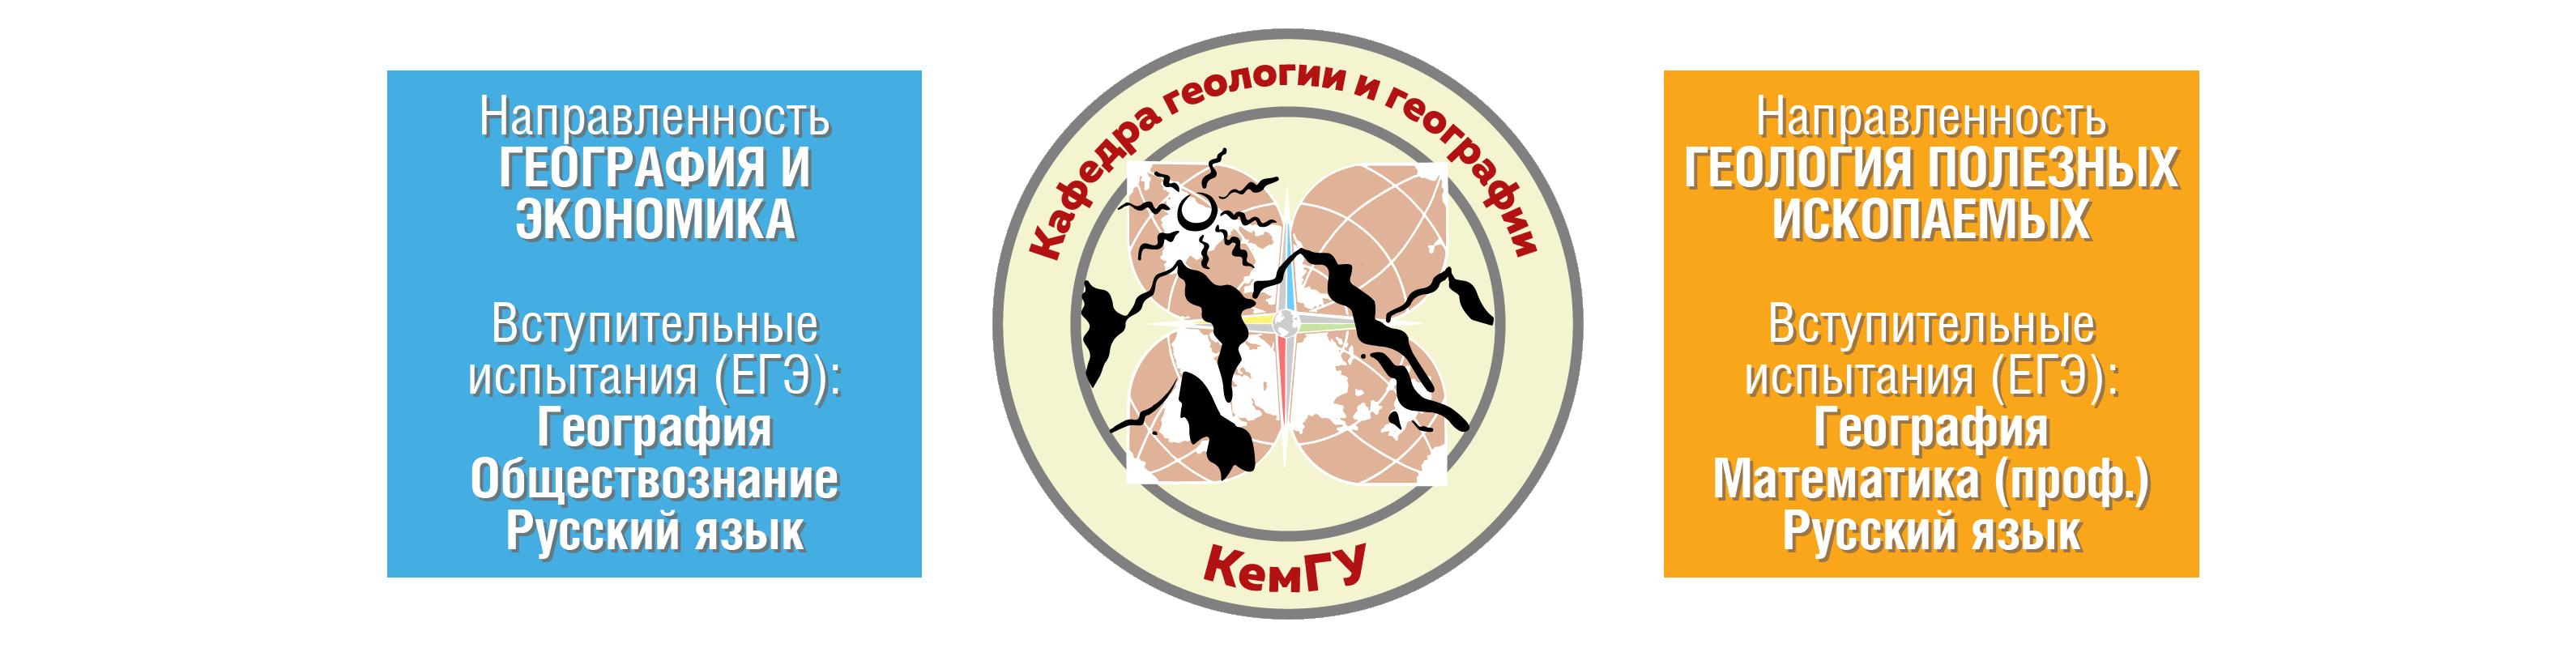 Сайт кафедры геологии и географии КемГУ